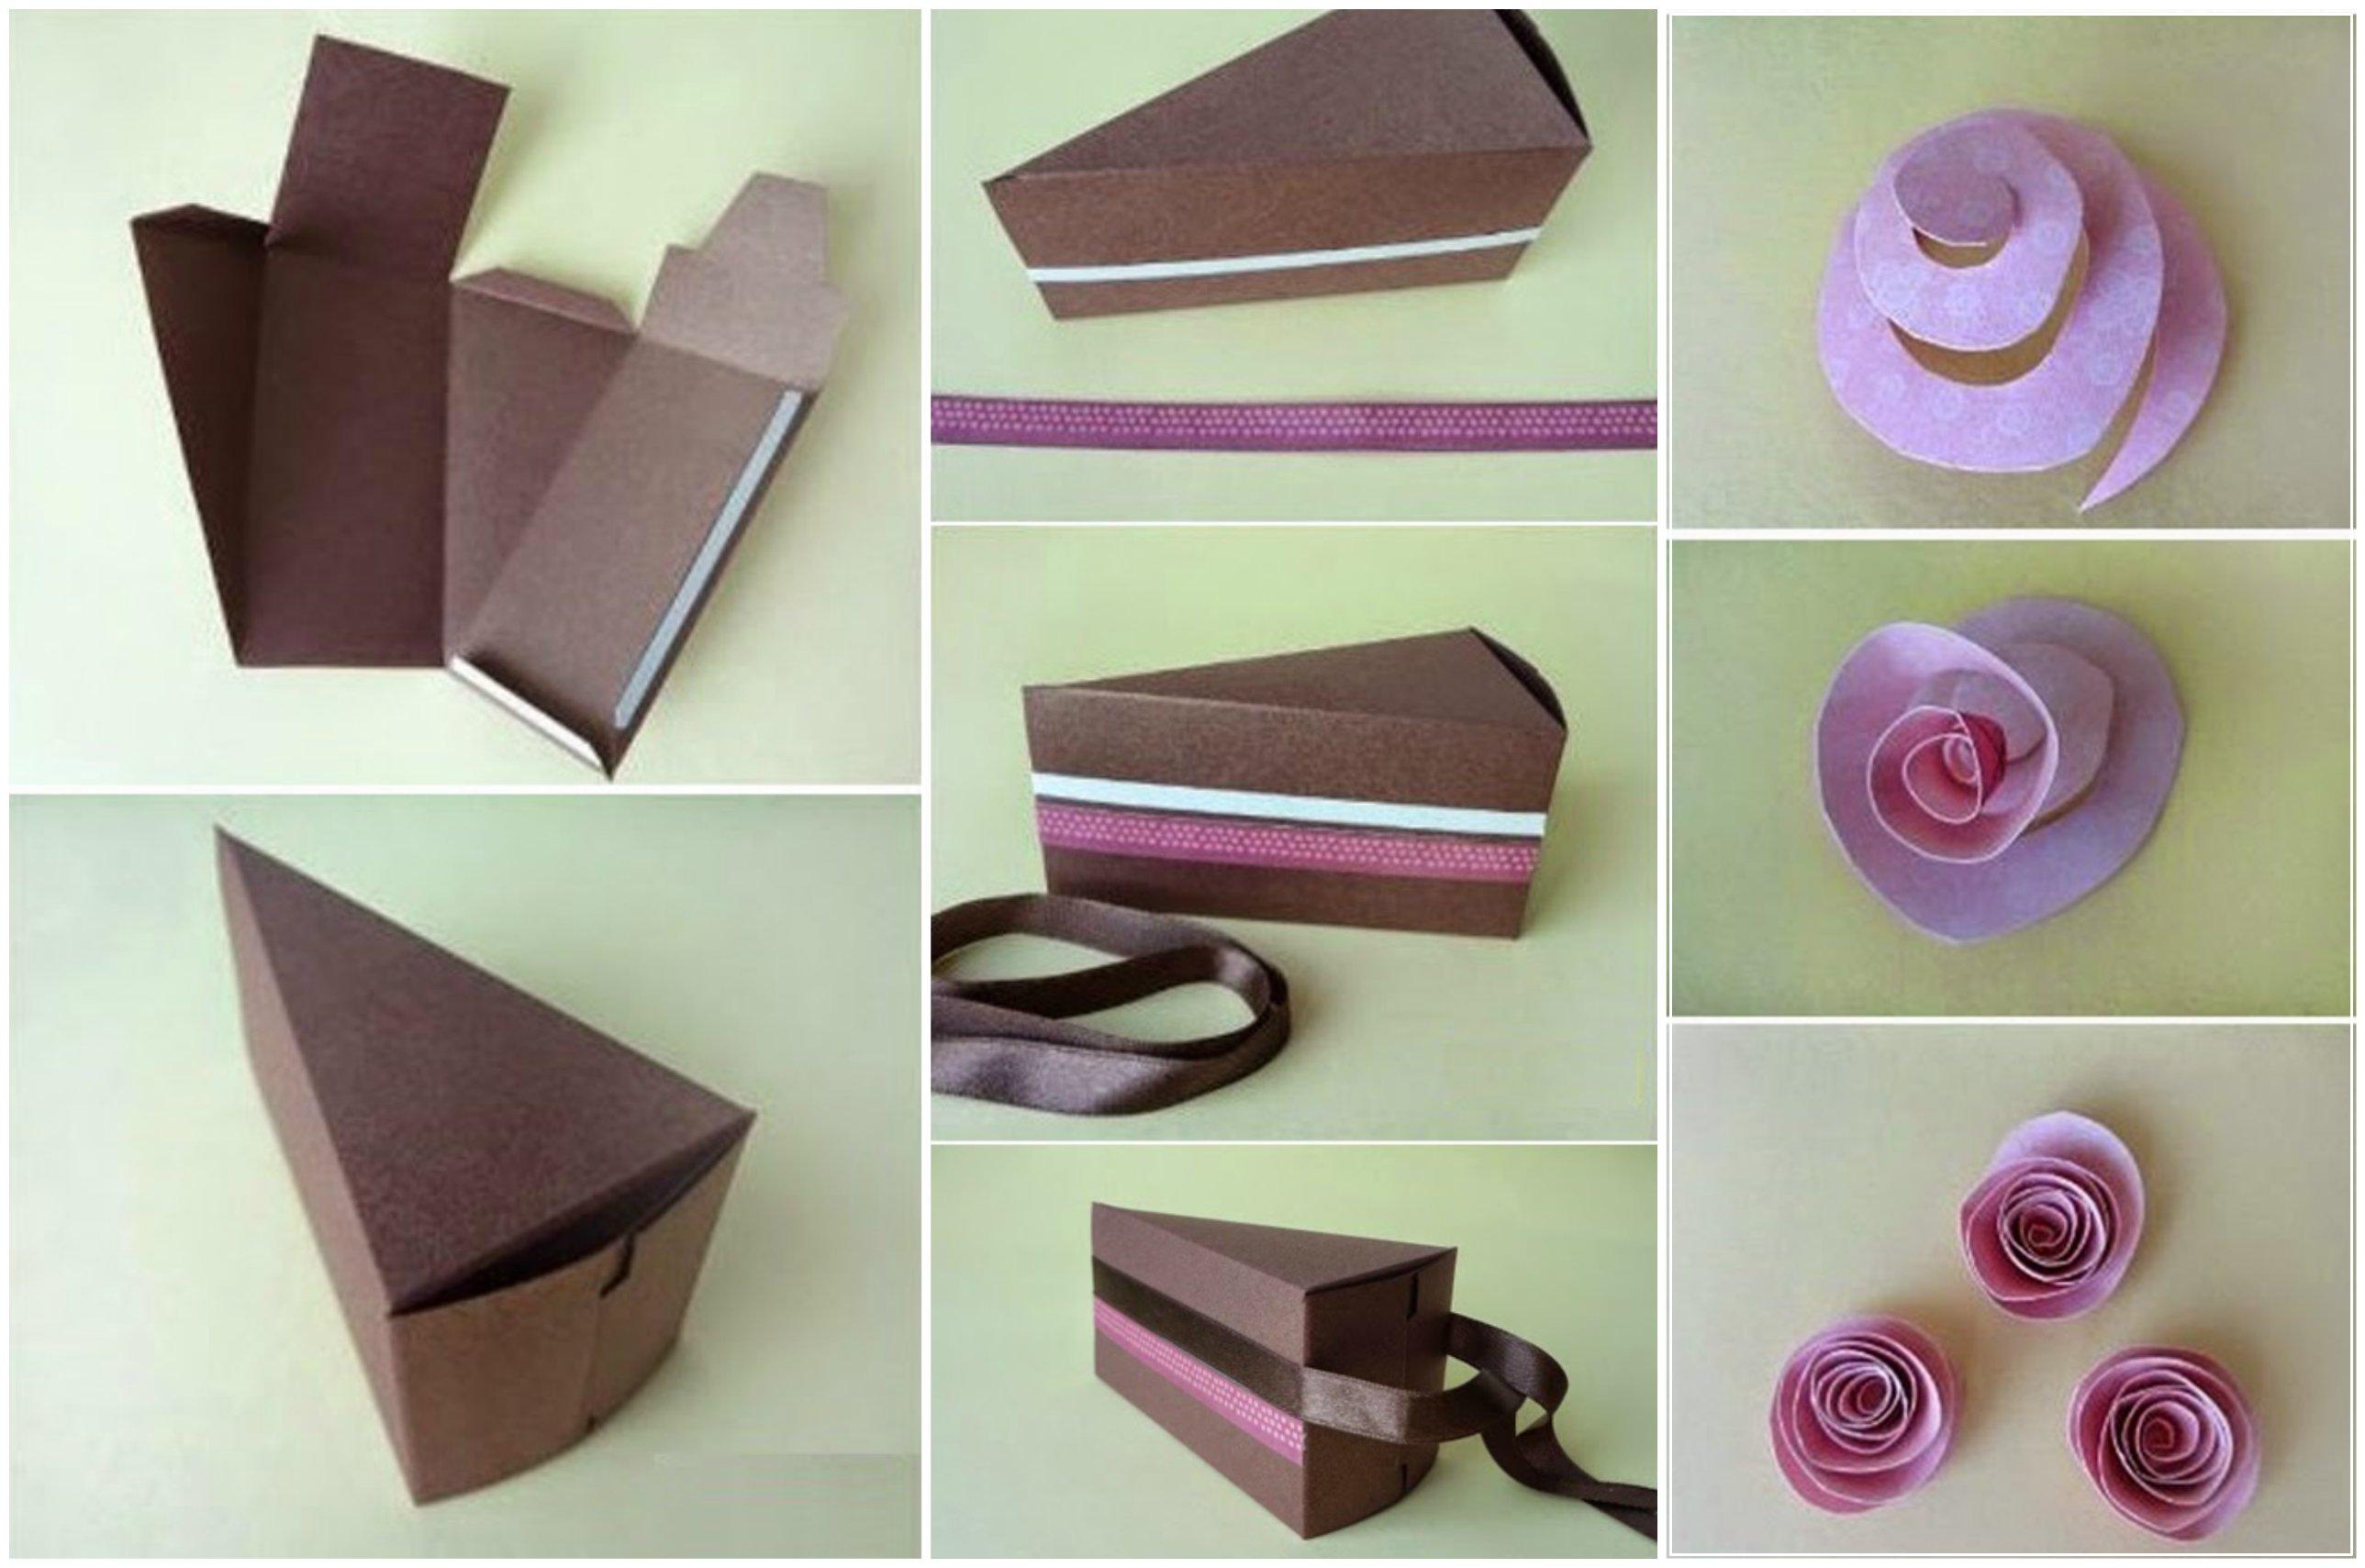 Tendencia 2015 souvenirs en cajitas de torta escuela - Como hacer cajitas de cartulina ...